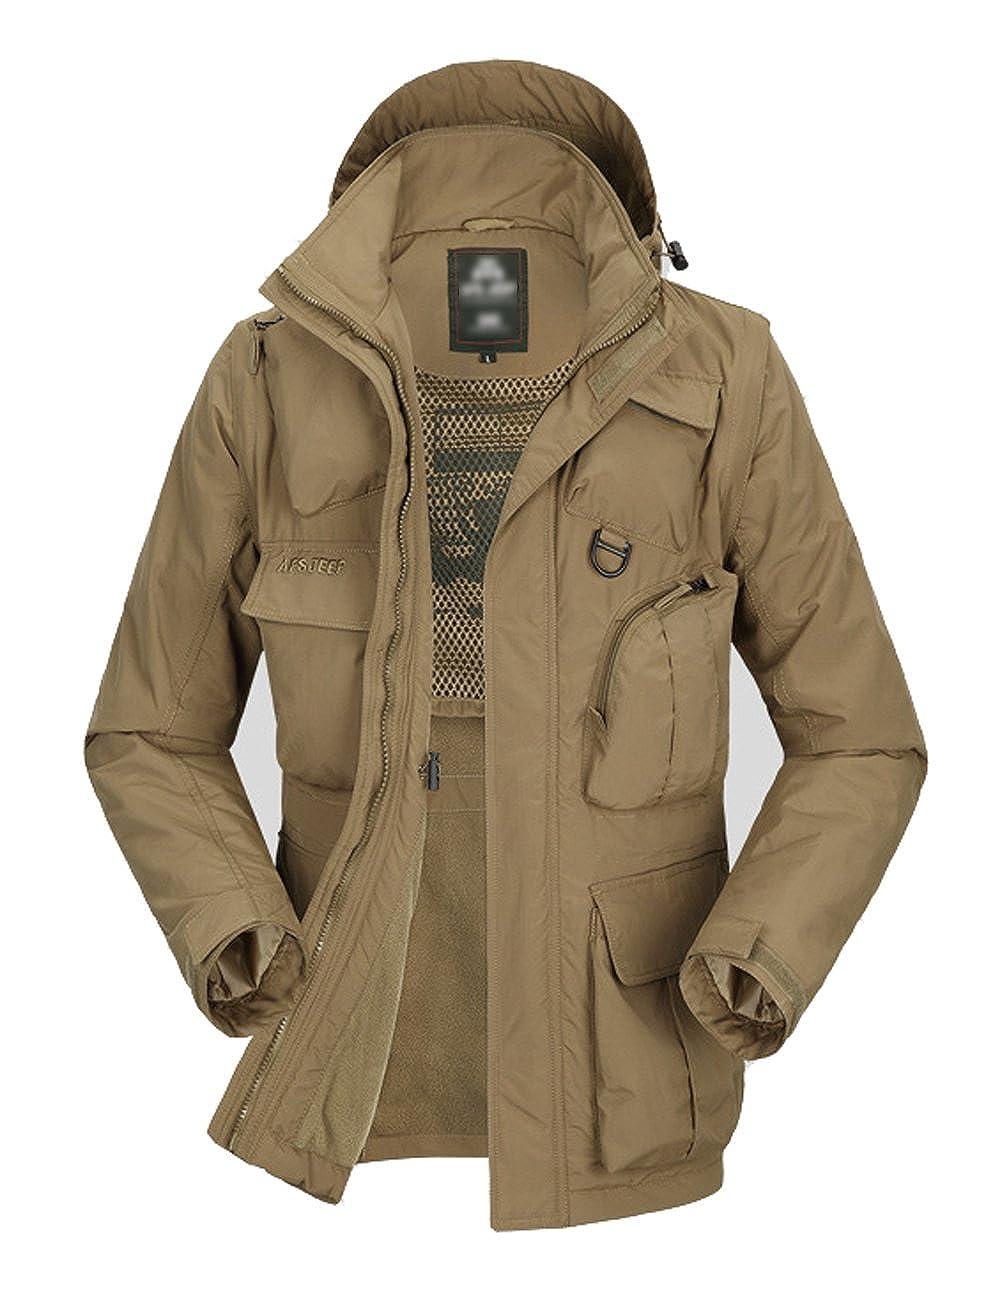 Micmall Men's Winter Waterproof Climbing Hiking 2-in-1 Front-zip Hooded Jacket Mic-8761